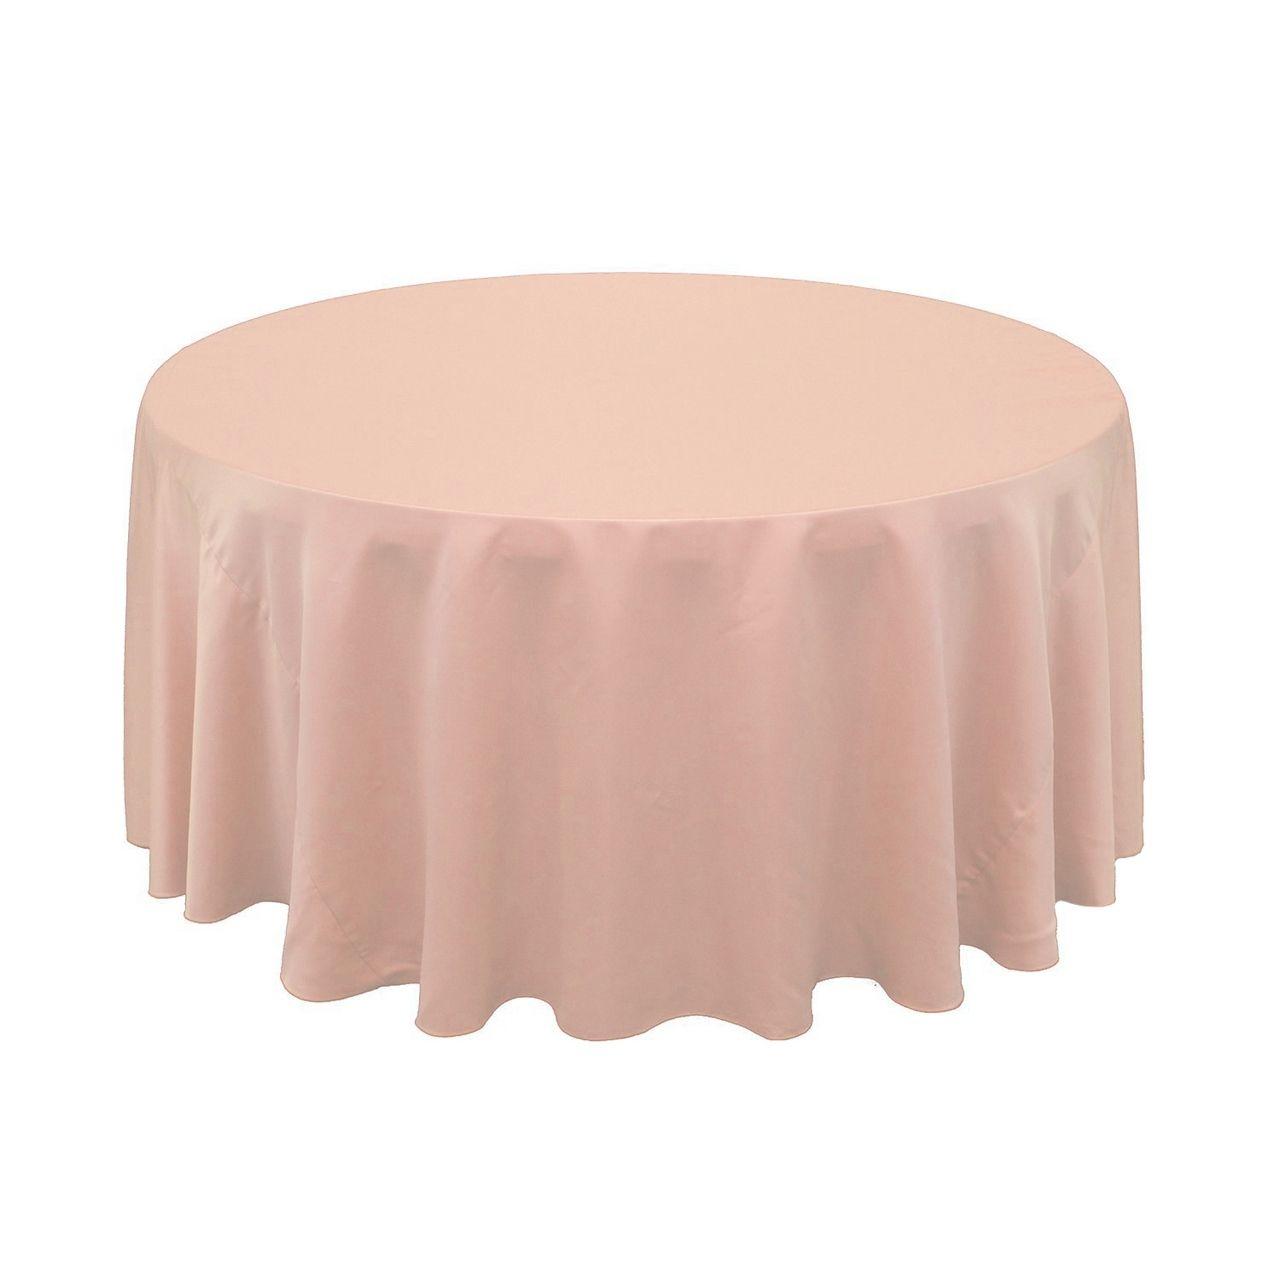 Bridal Tablecloths   120 Inch Lu0027amour Round Tablecloth Blush